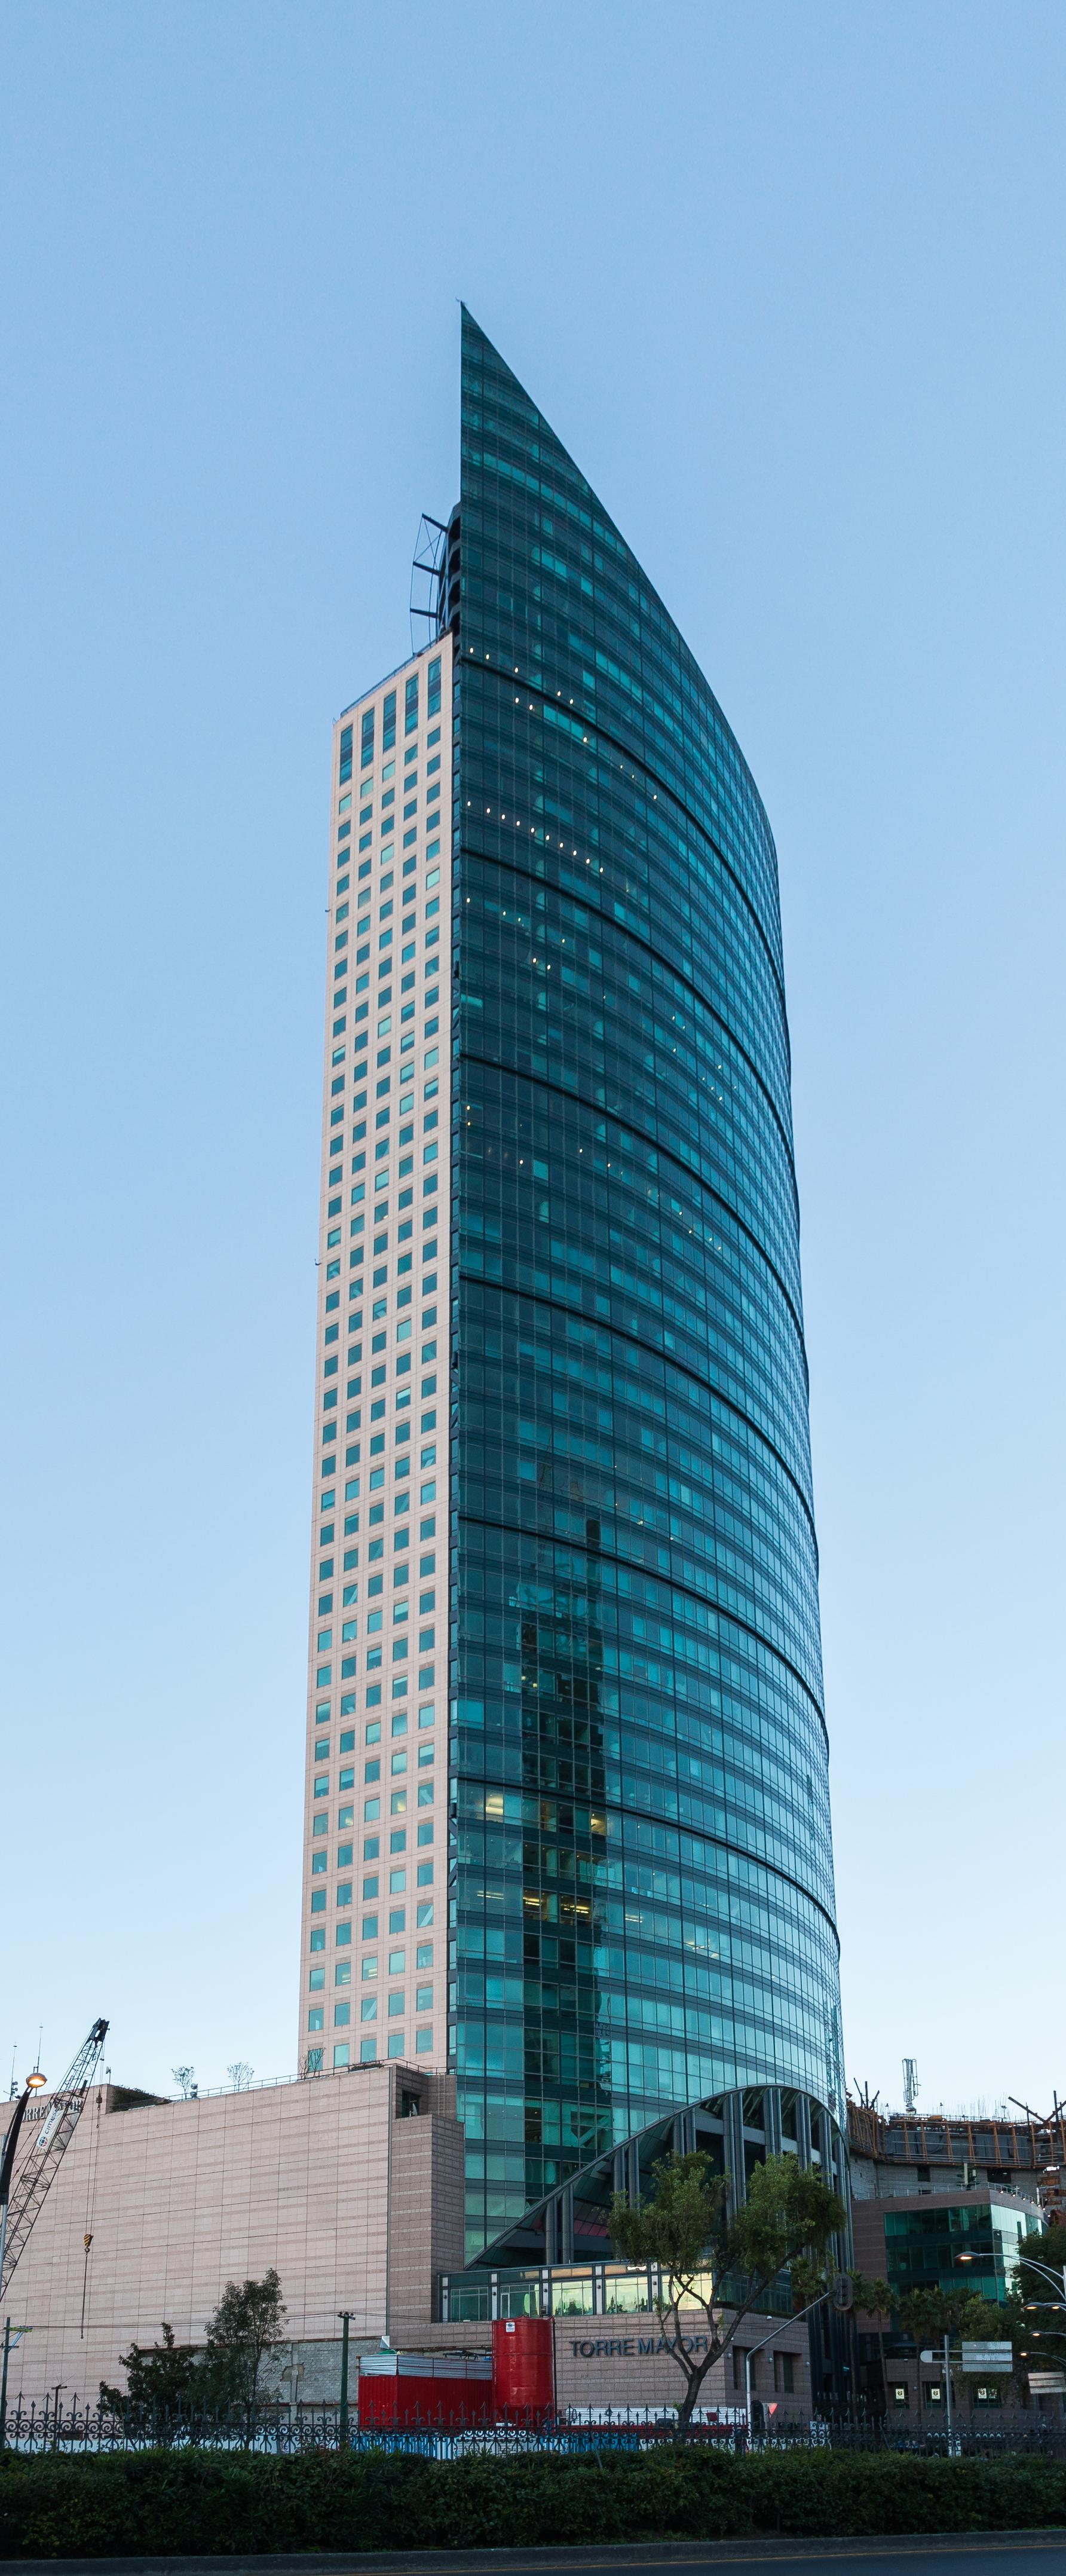 792869660cb0 Torre Mayor - Wikipedia